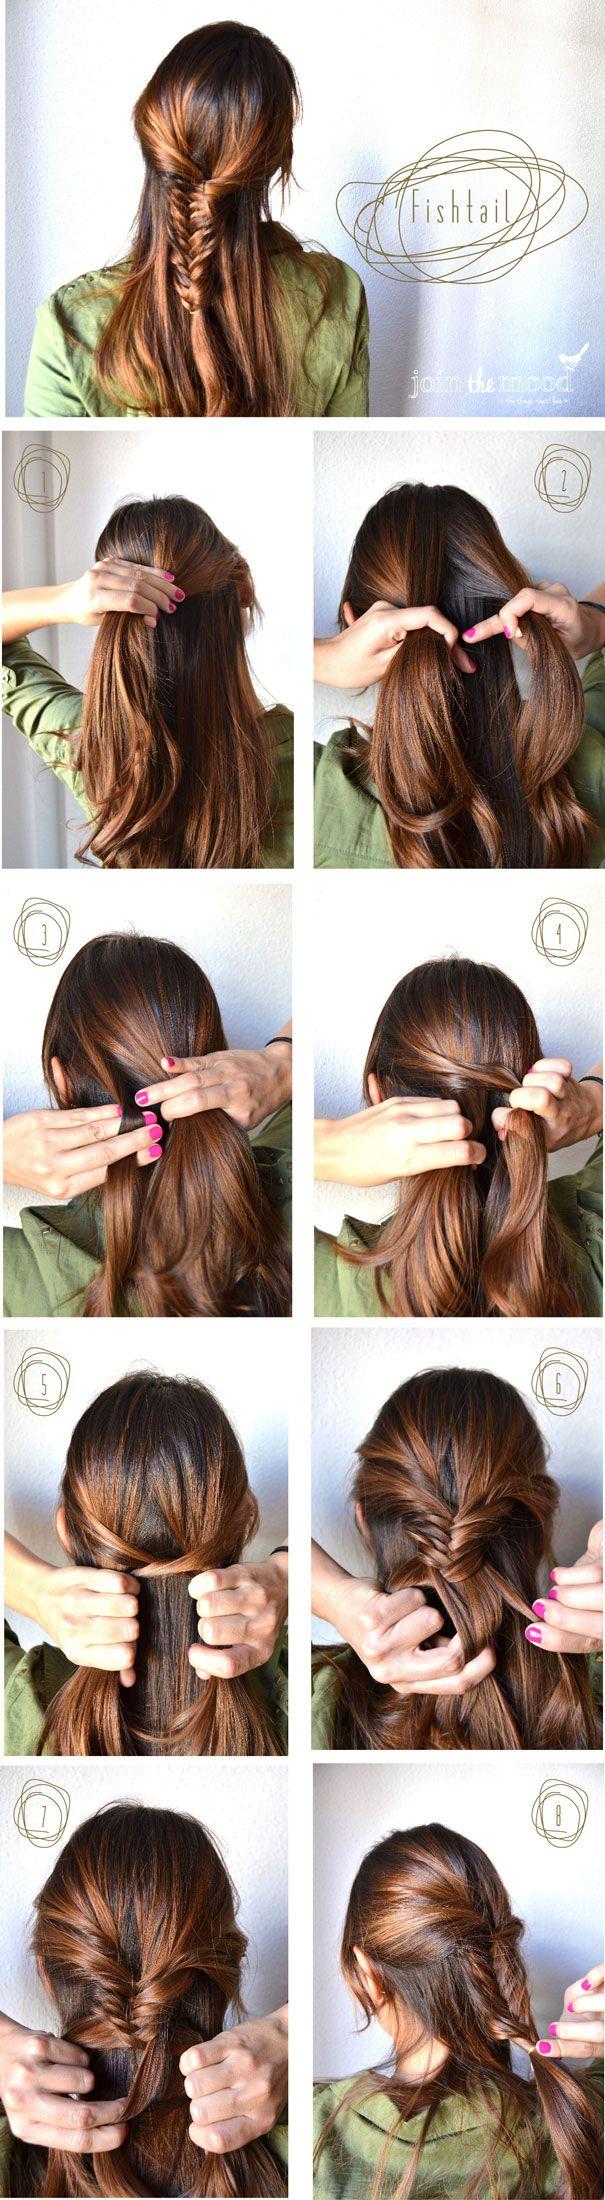 Fishtail / Braids #hair